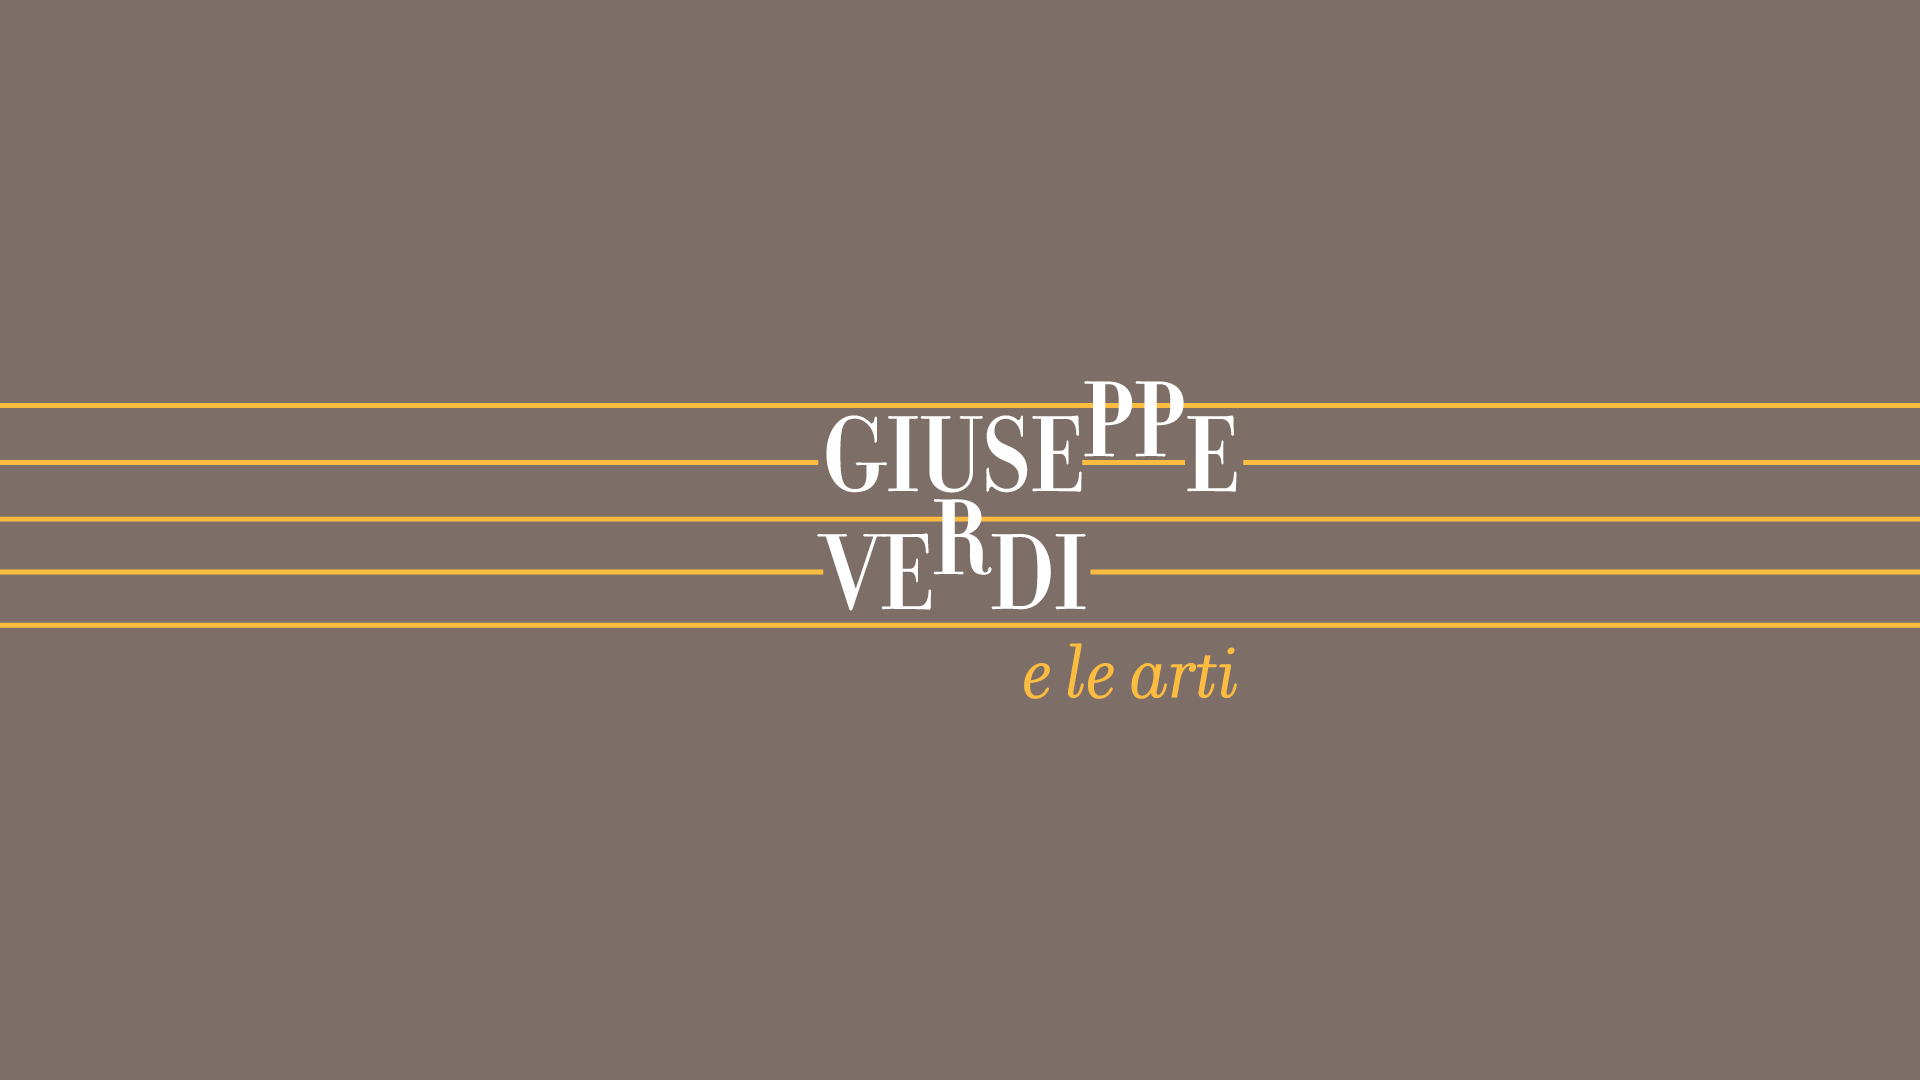 Giuseppe Verdi logo